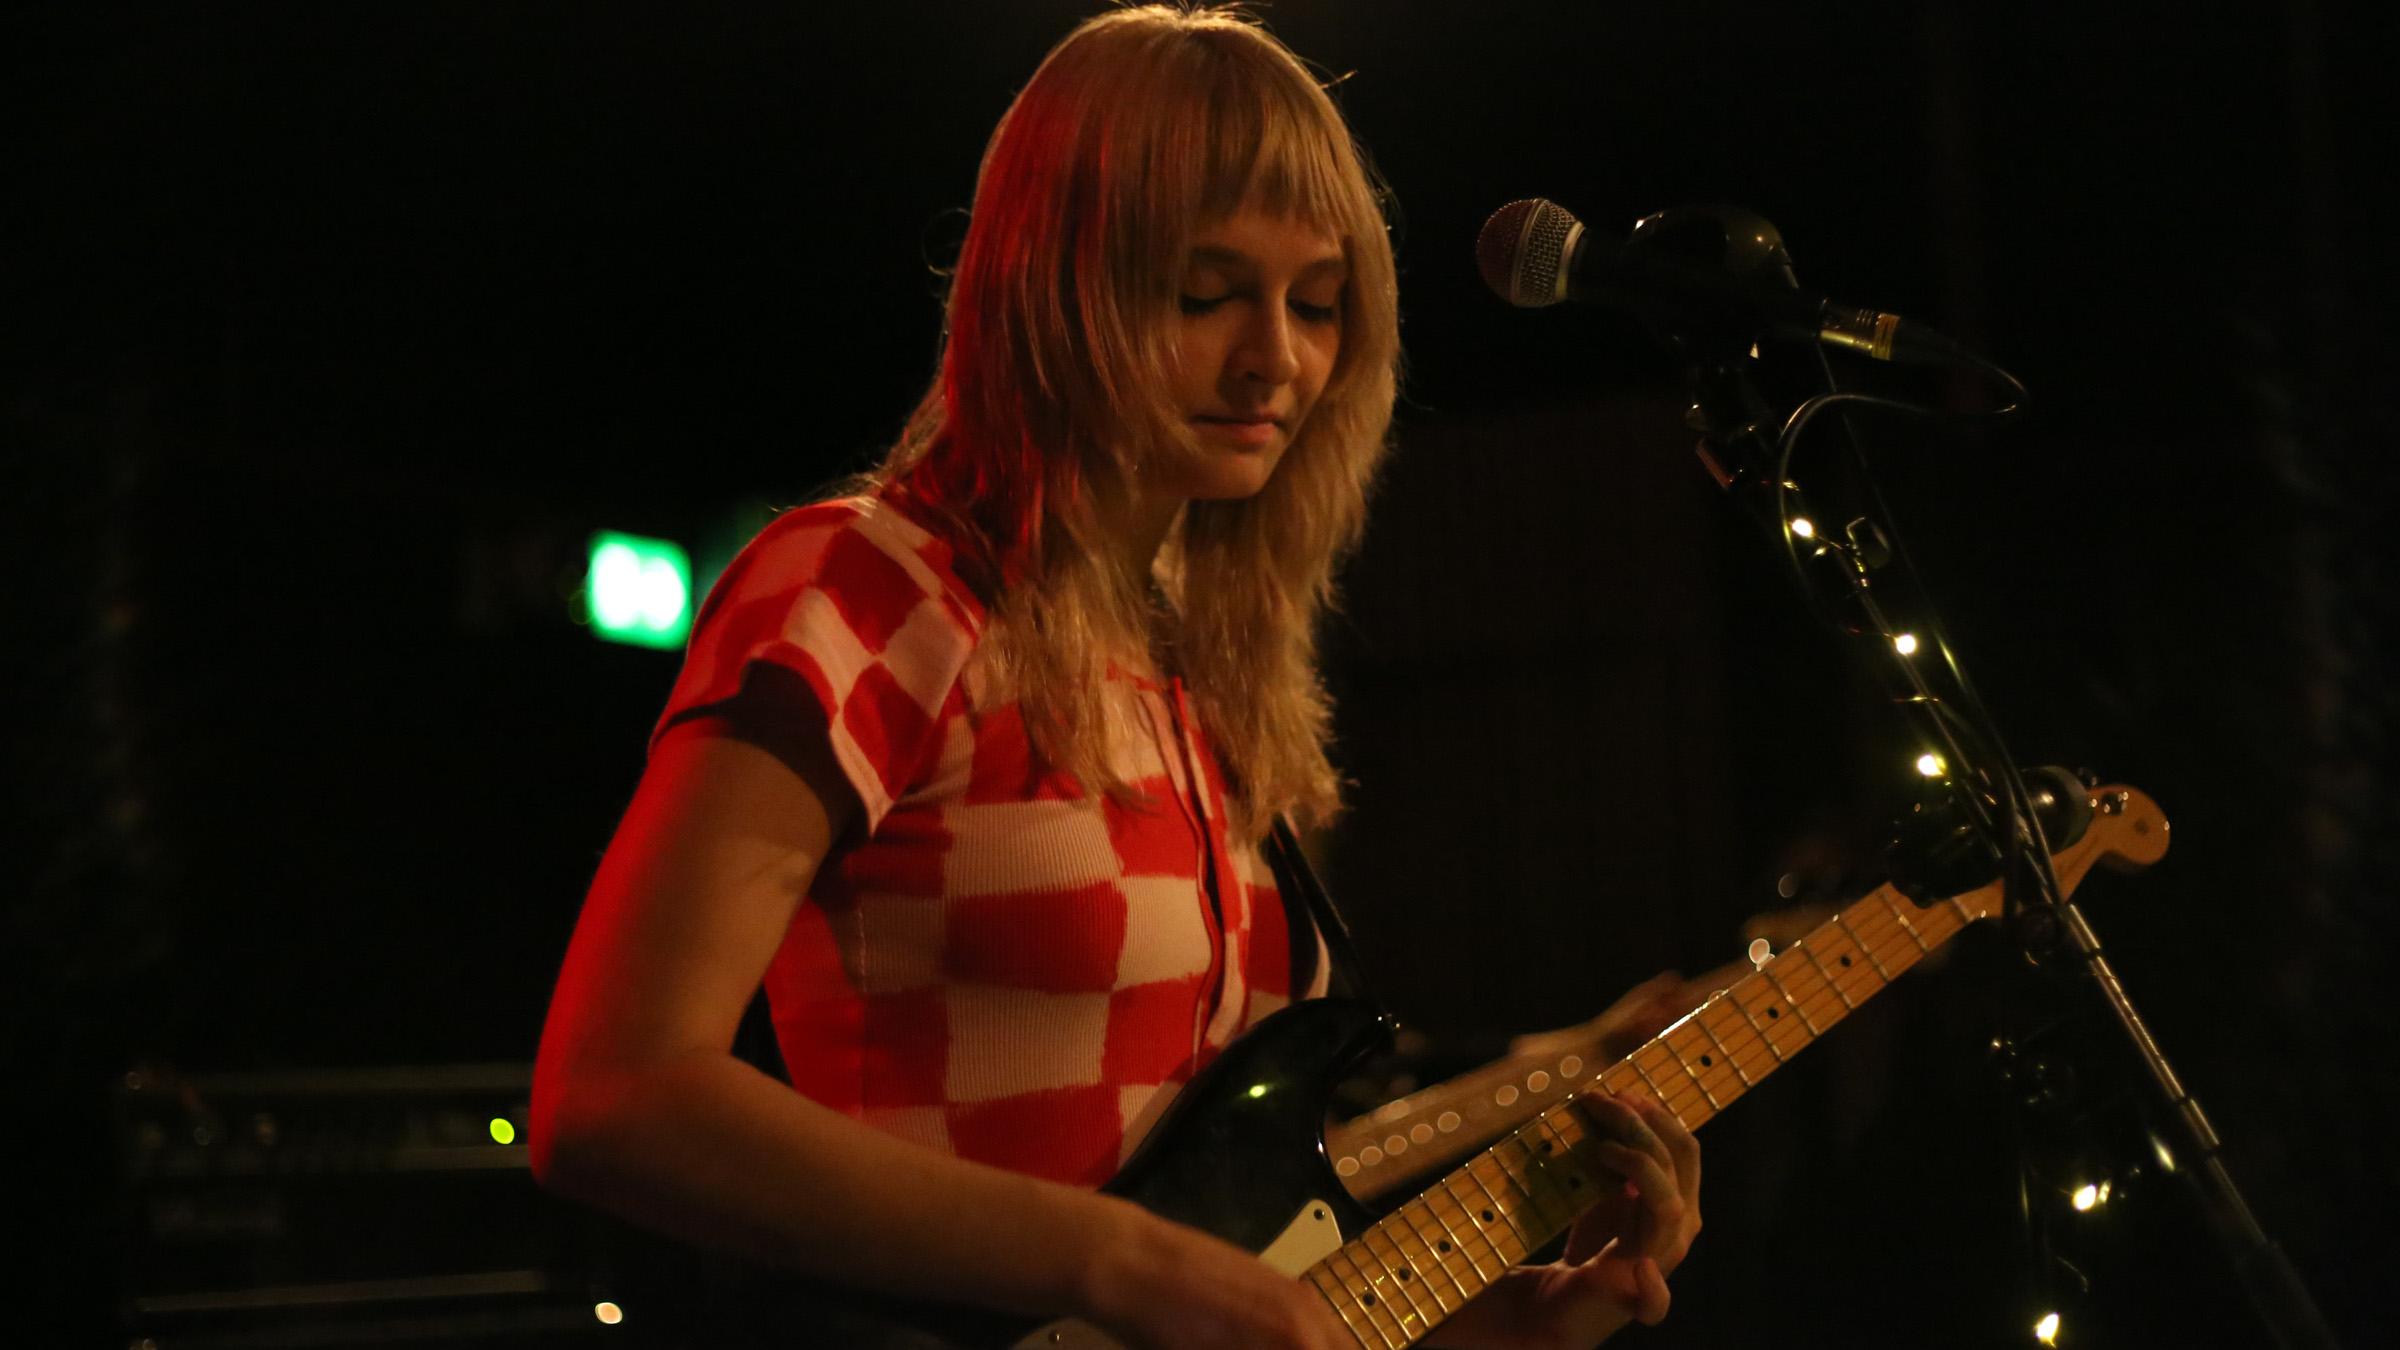 Clementine Creevy of Cherry Glazerr live at Ideal Bar in Copenhagen